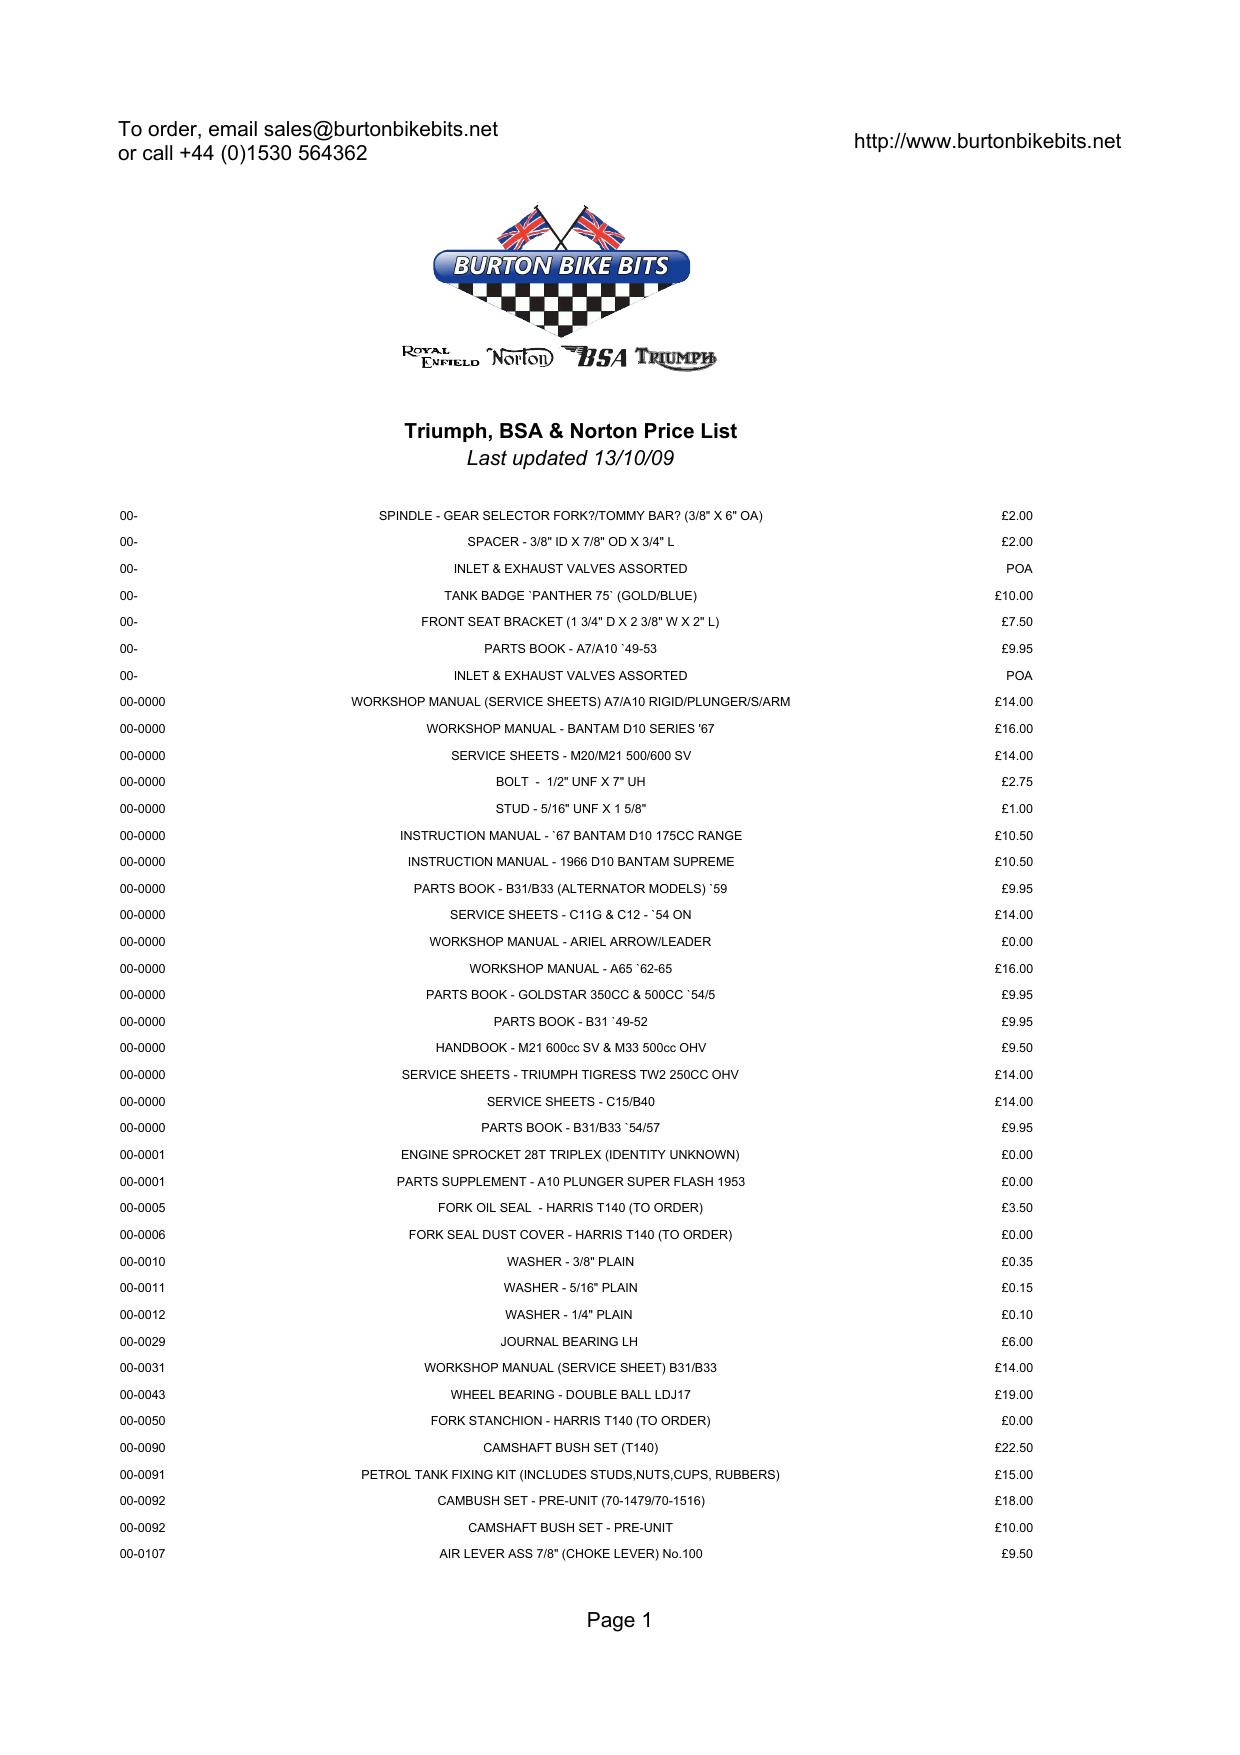 OPEN TYPE FOR CHAIN DRIVE X 2 06-0750 NORTON COMMANDO CLUTCH BEARING